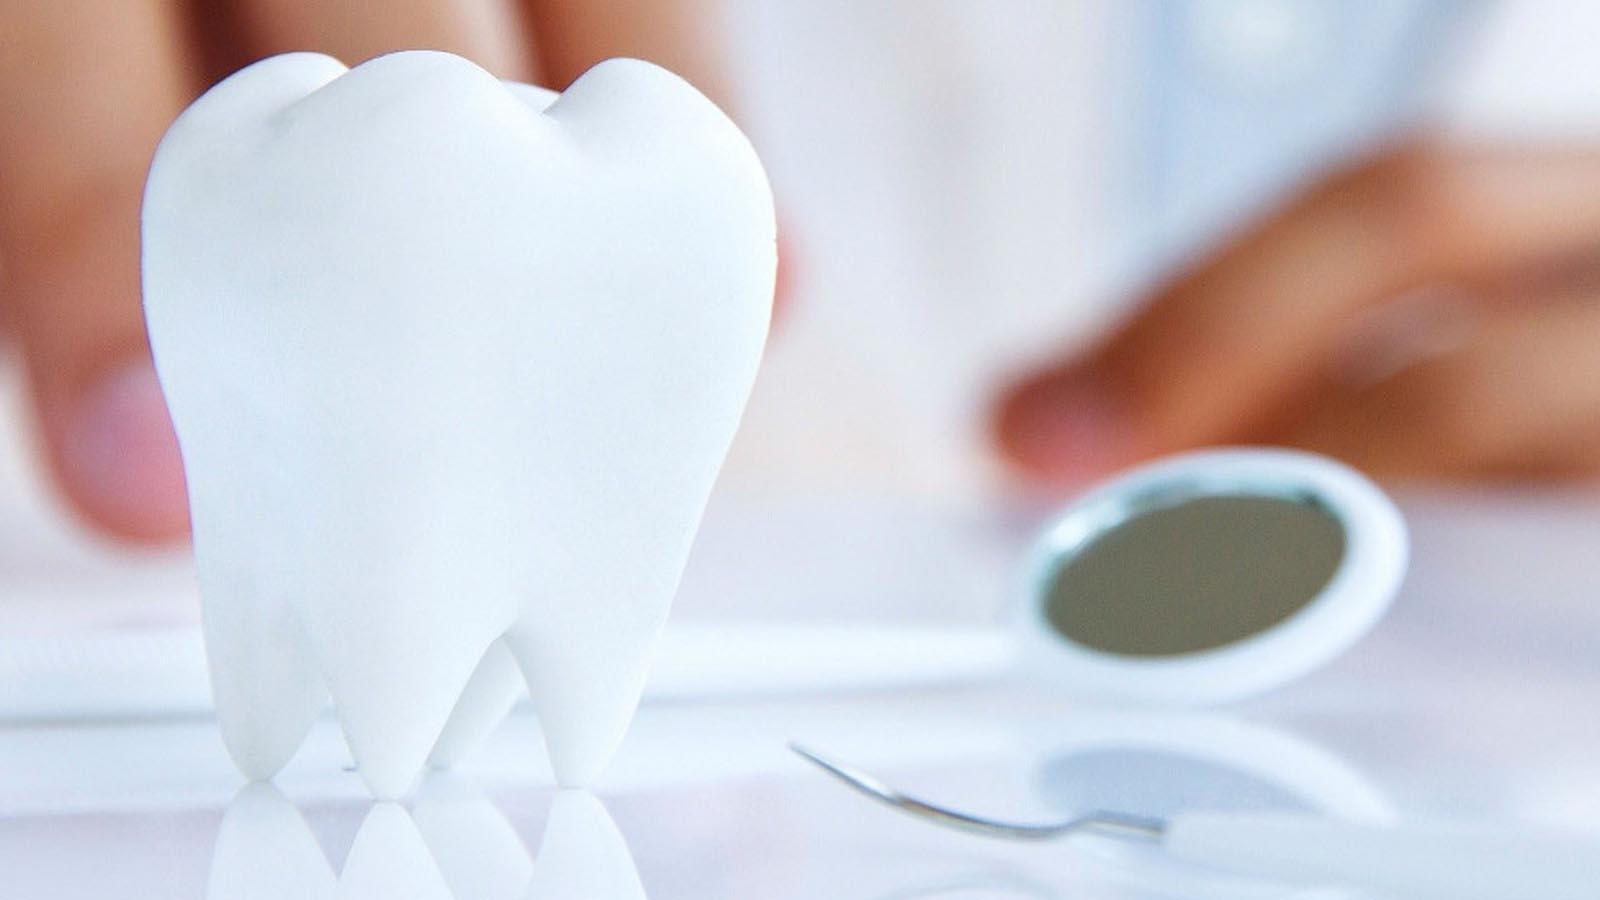 periodieke controle - Mijn tand tandarts hengelo